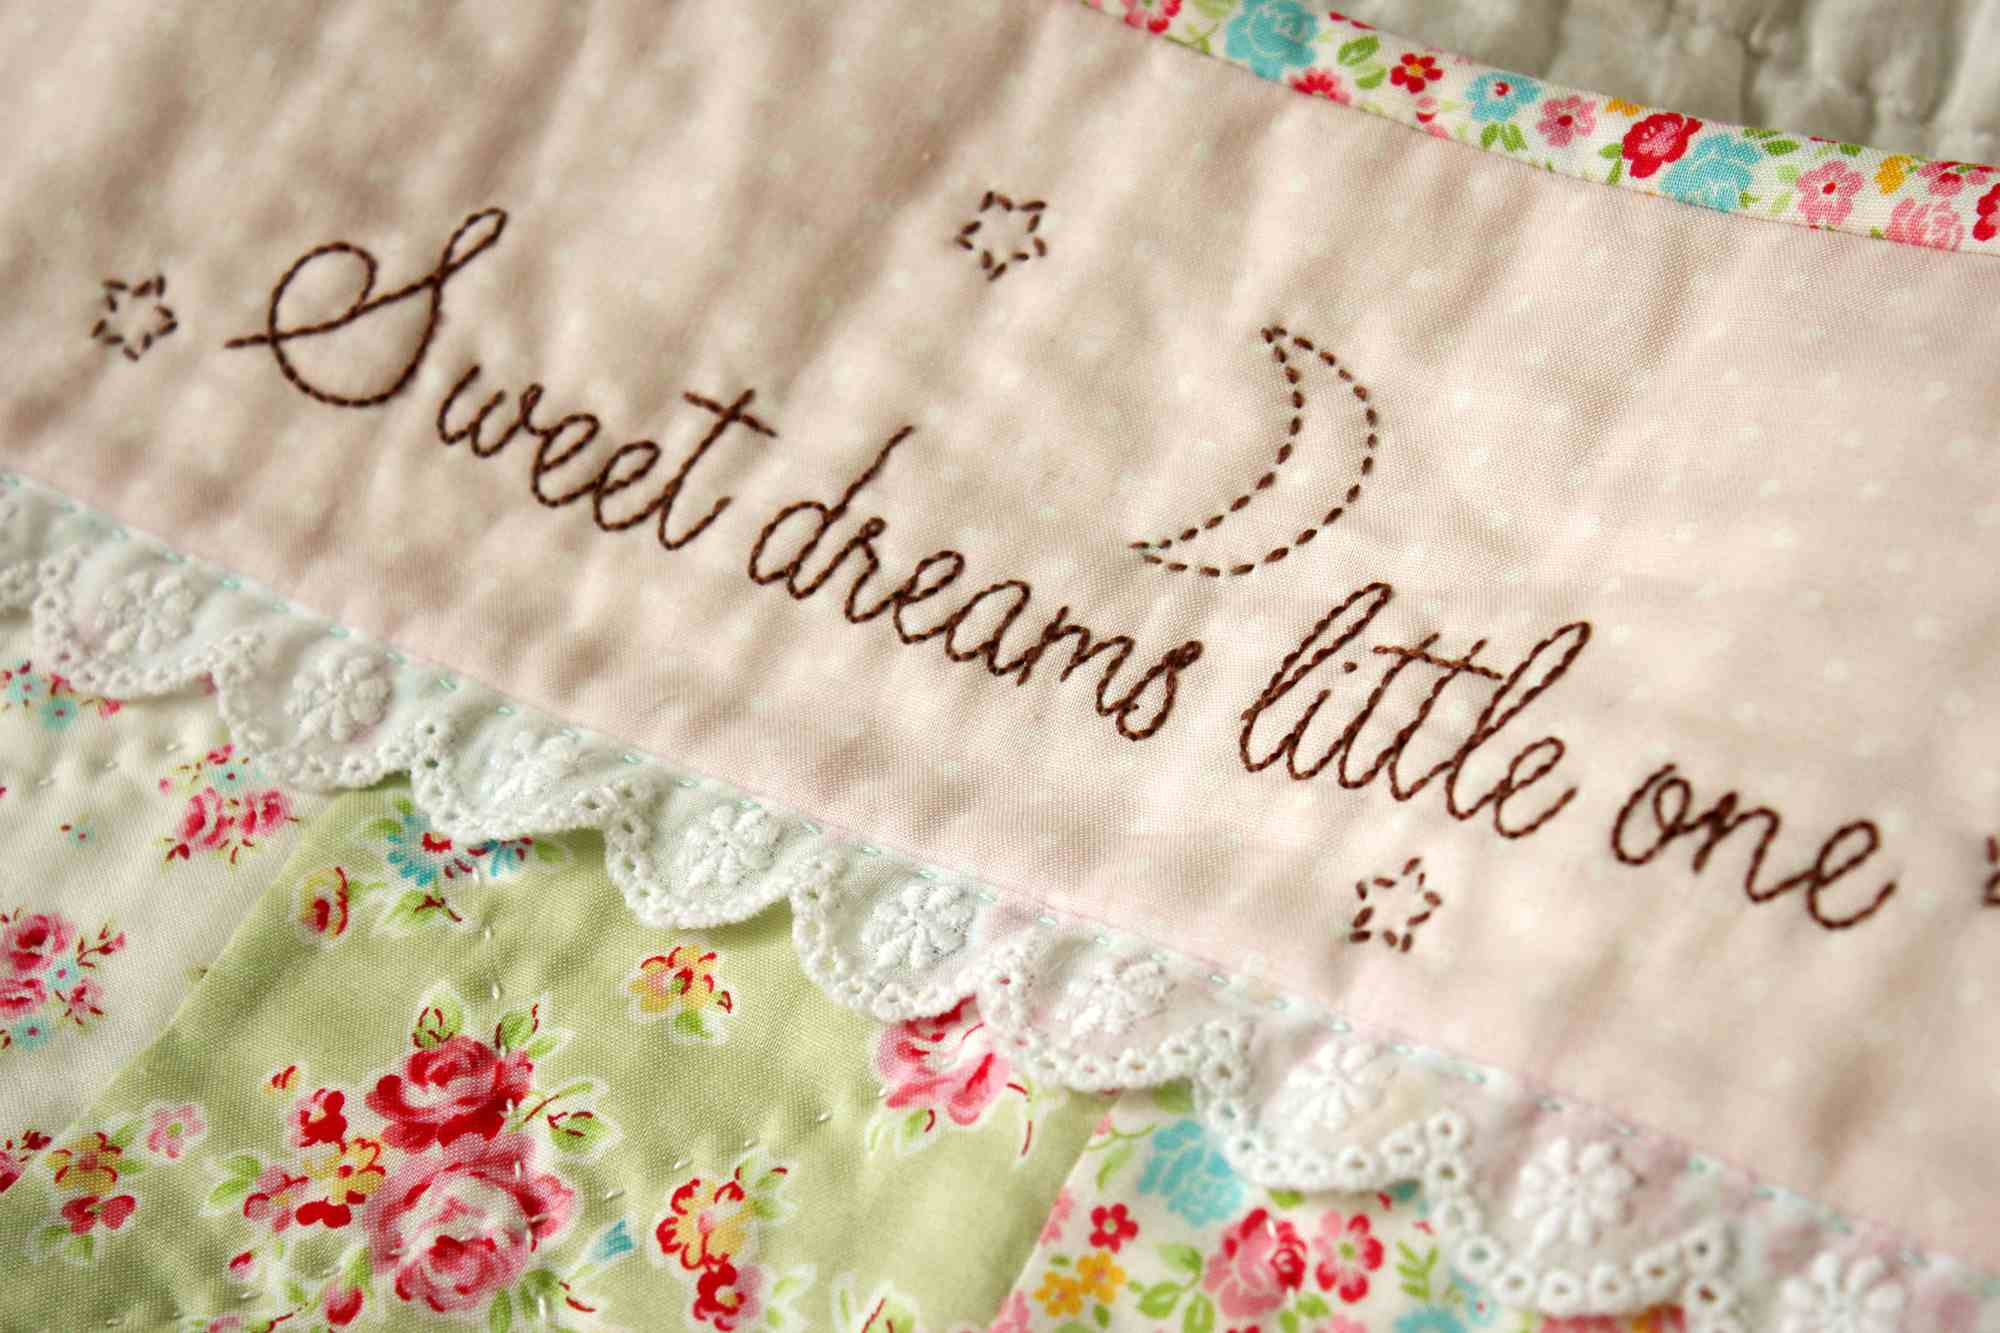 Sweet Dreams Little One Embroidery Pattern